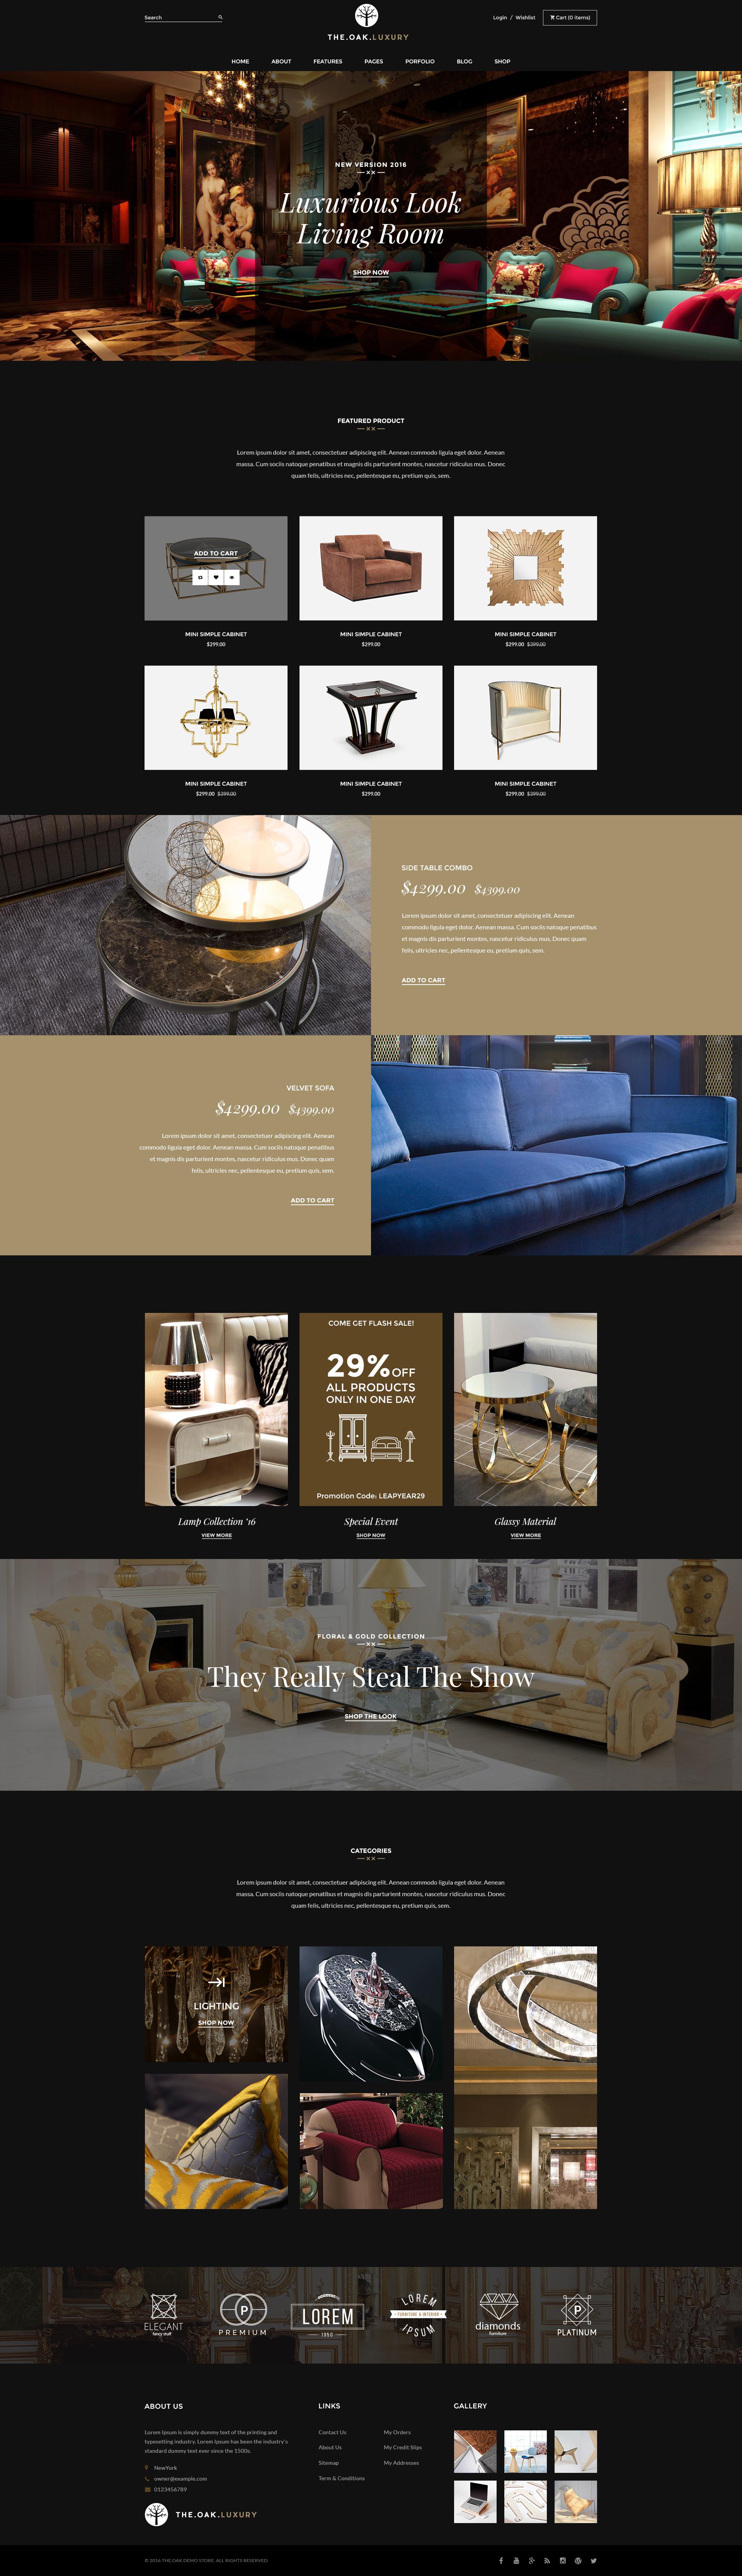 Nice WordPress WooCommerce Theme For Furniture Decoration Design ECommerce Store    WP TheOak